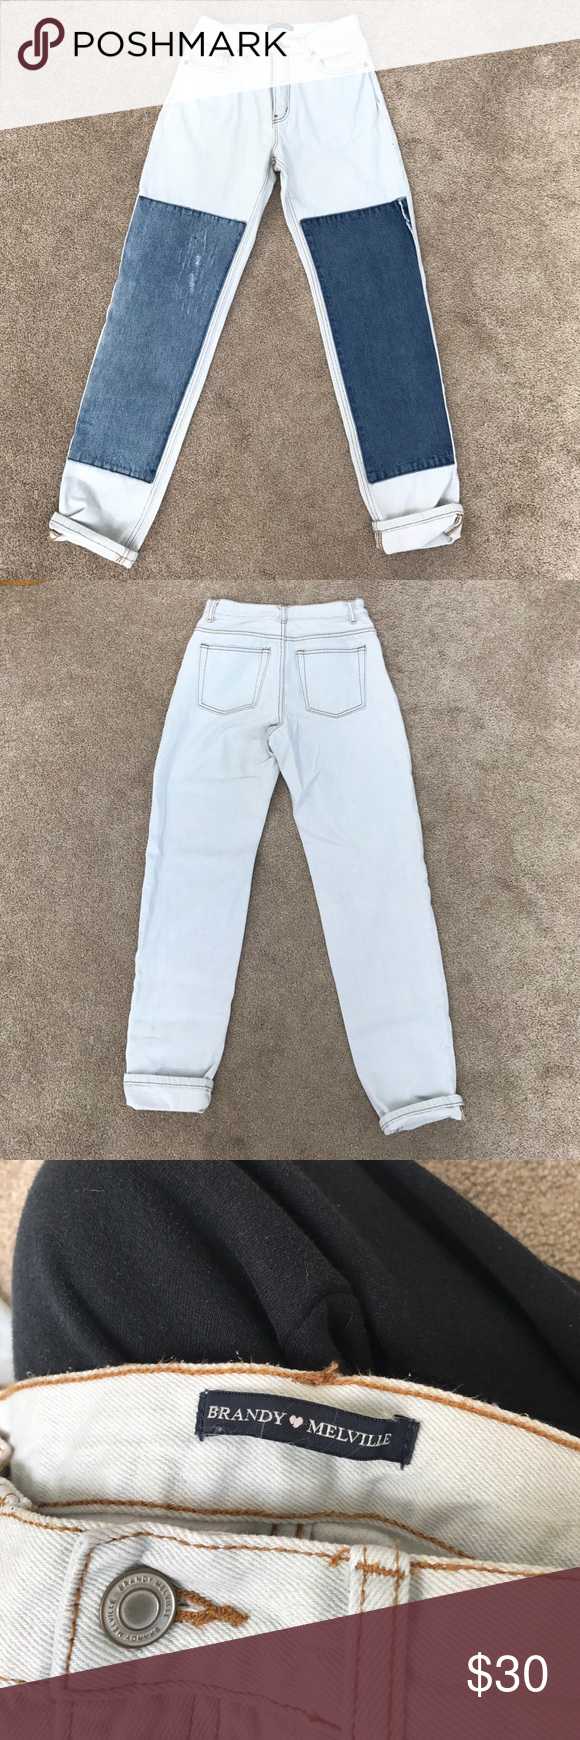 Brandy Melville Boyfriend Jeans Super comfy, worn once, brown stitching and darker blue panels Brandy Melville Jeans Boyfriend